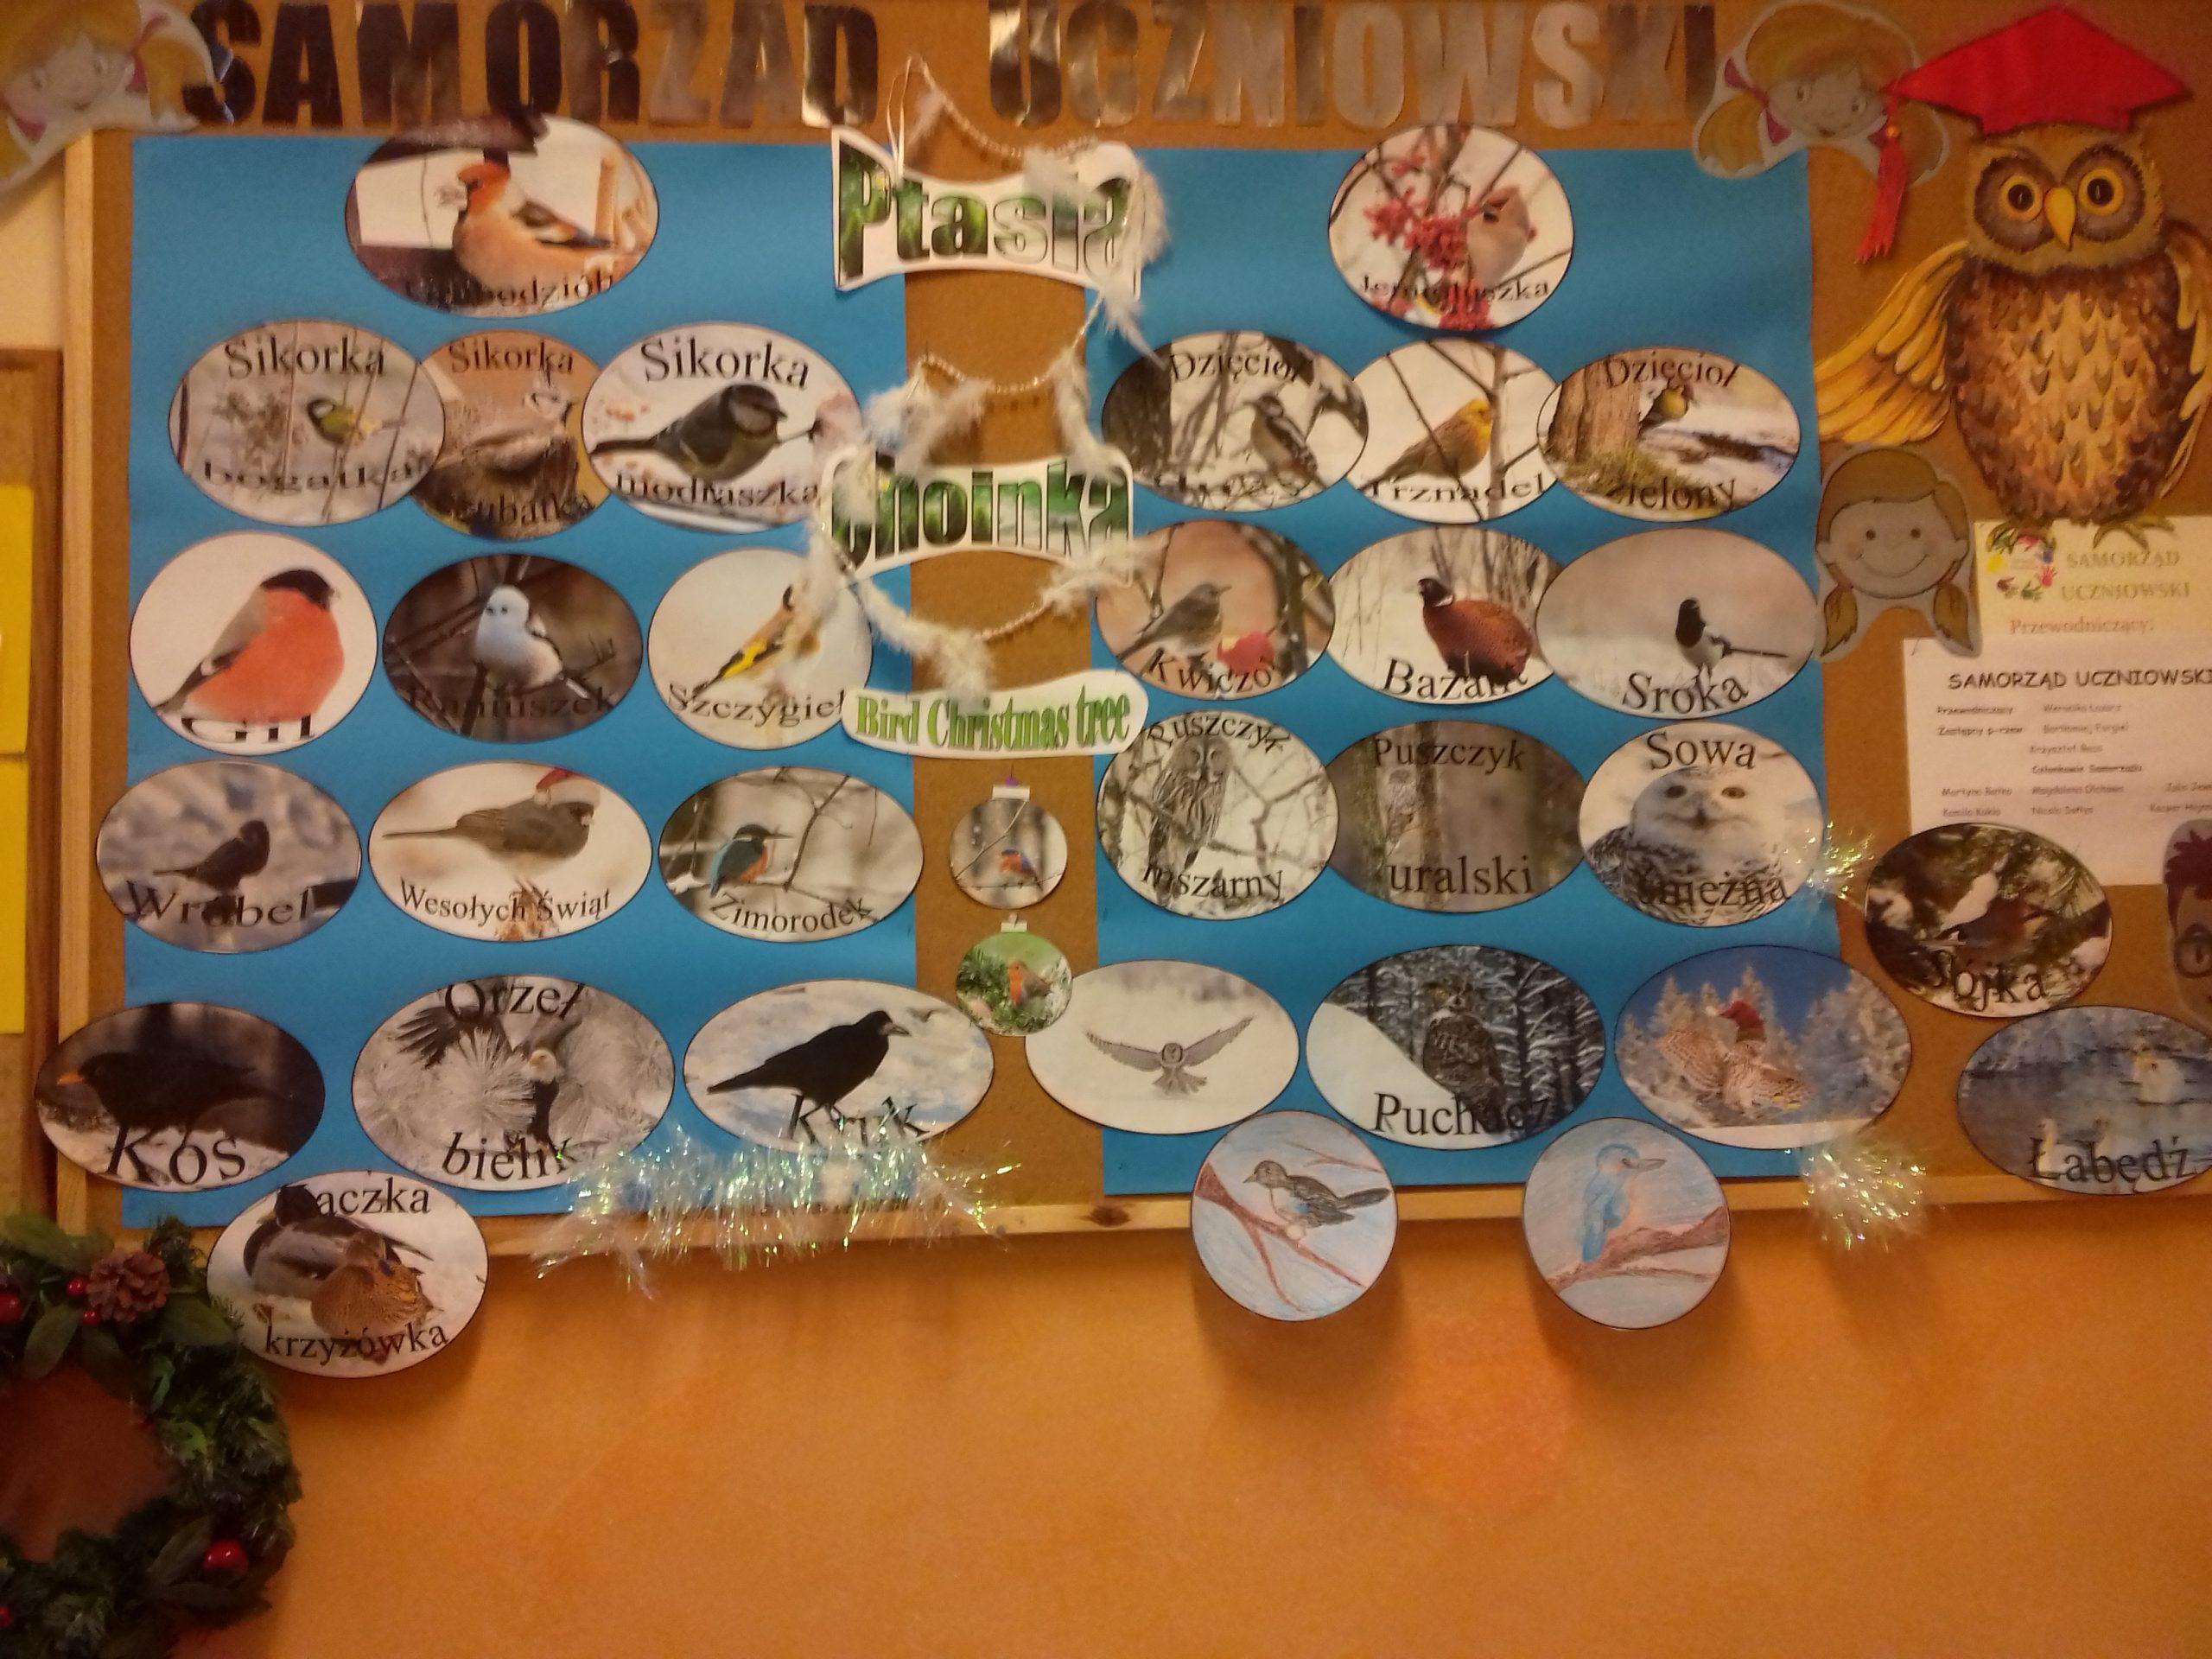 Ptasia choinka – Bird Christmas Tree